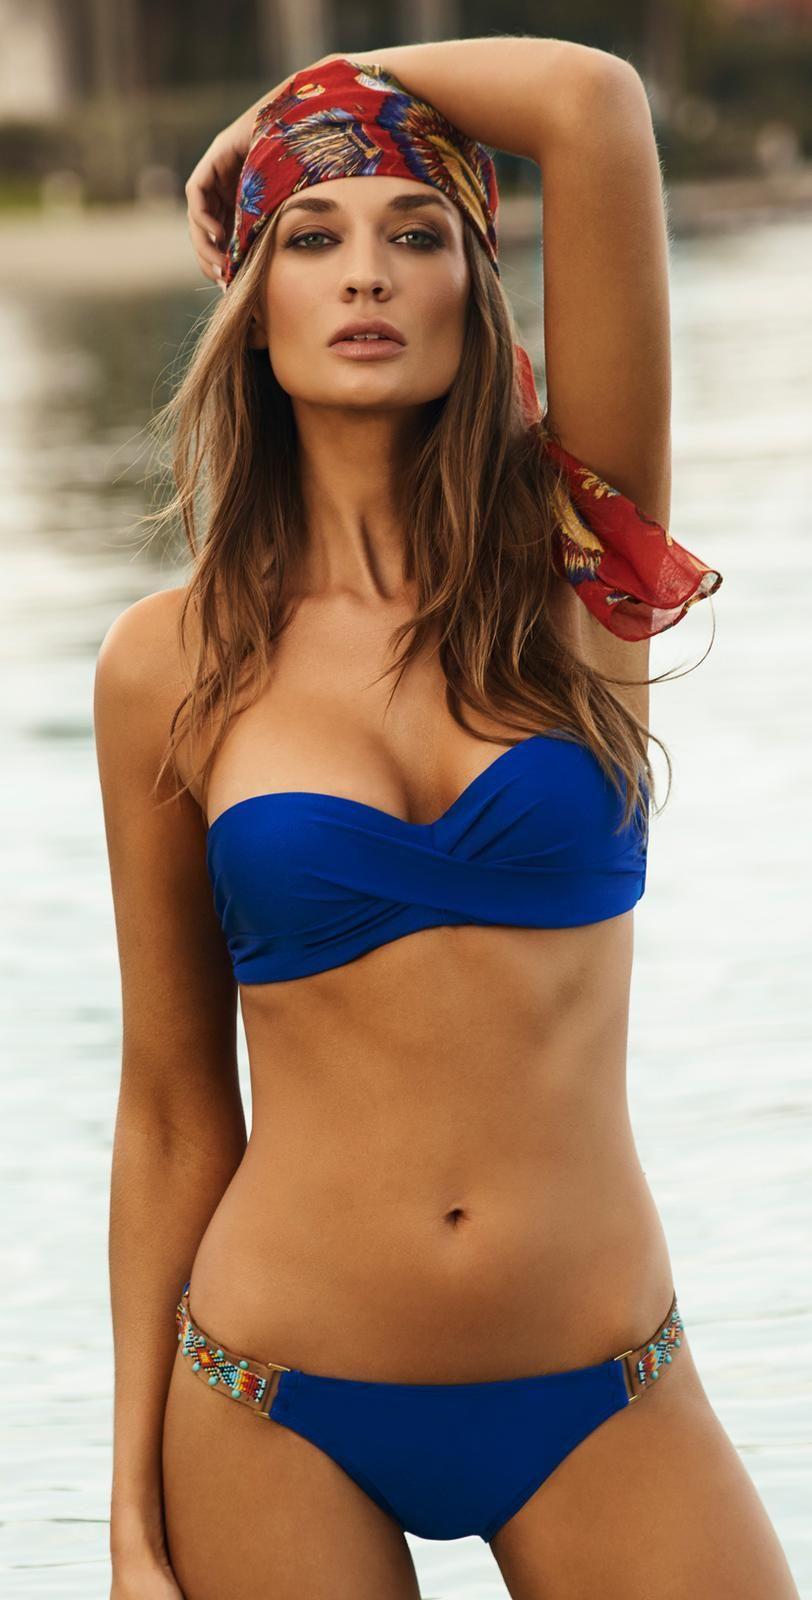 Busty beach boobs